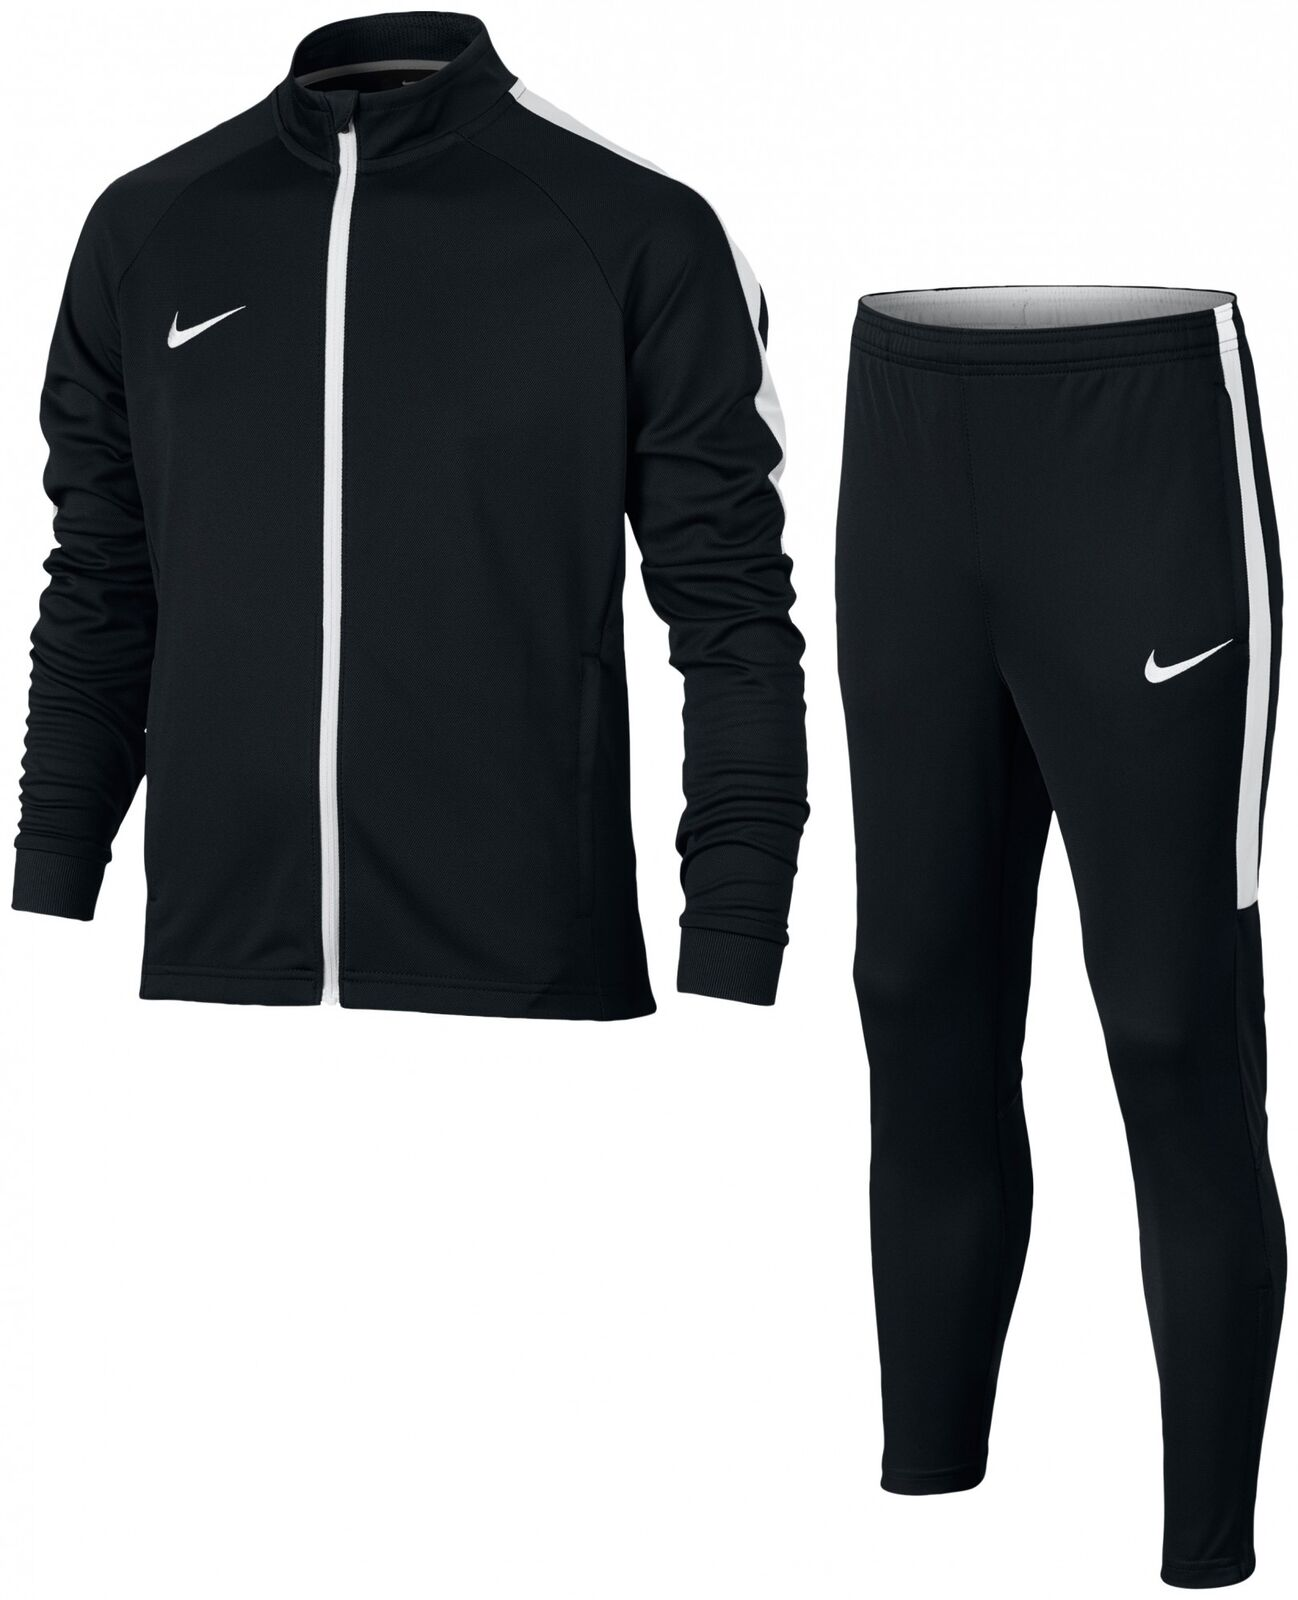 Nike Kinder Trainingsanzug  NK DRY ACDMY Jungen Fußballtrainingsanzug Sportanzug